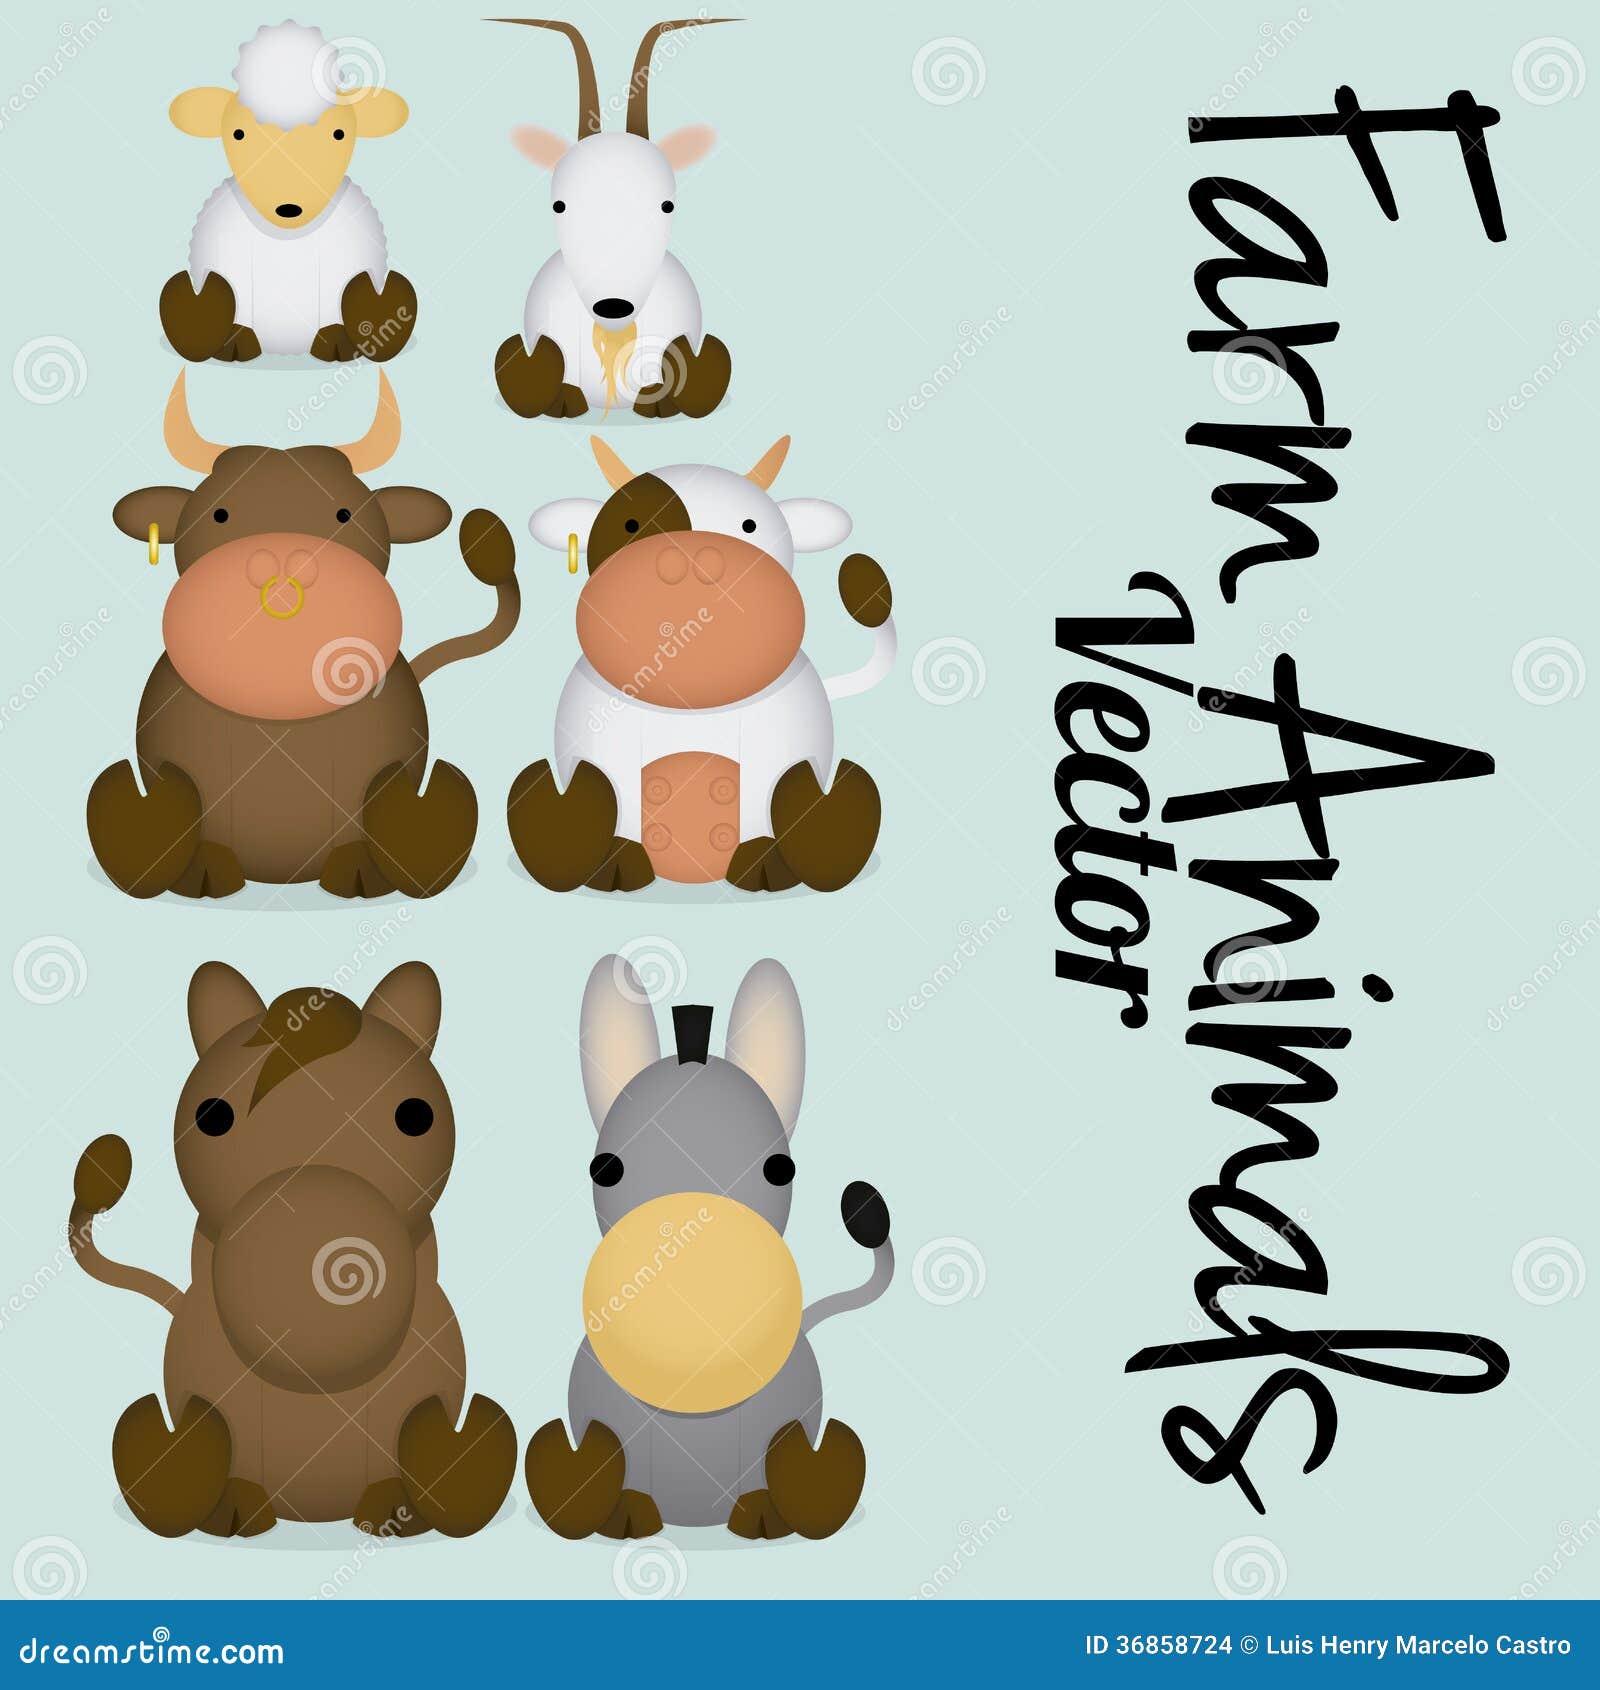 Cute farm animals cartoon